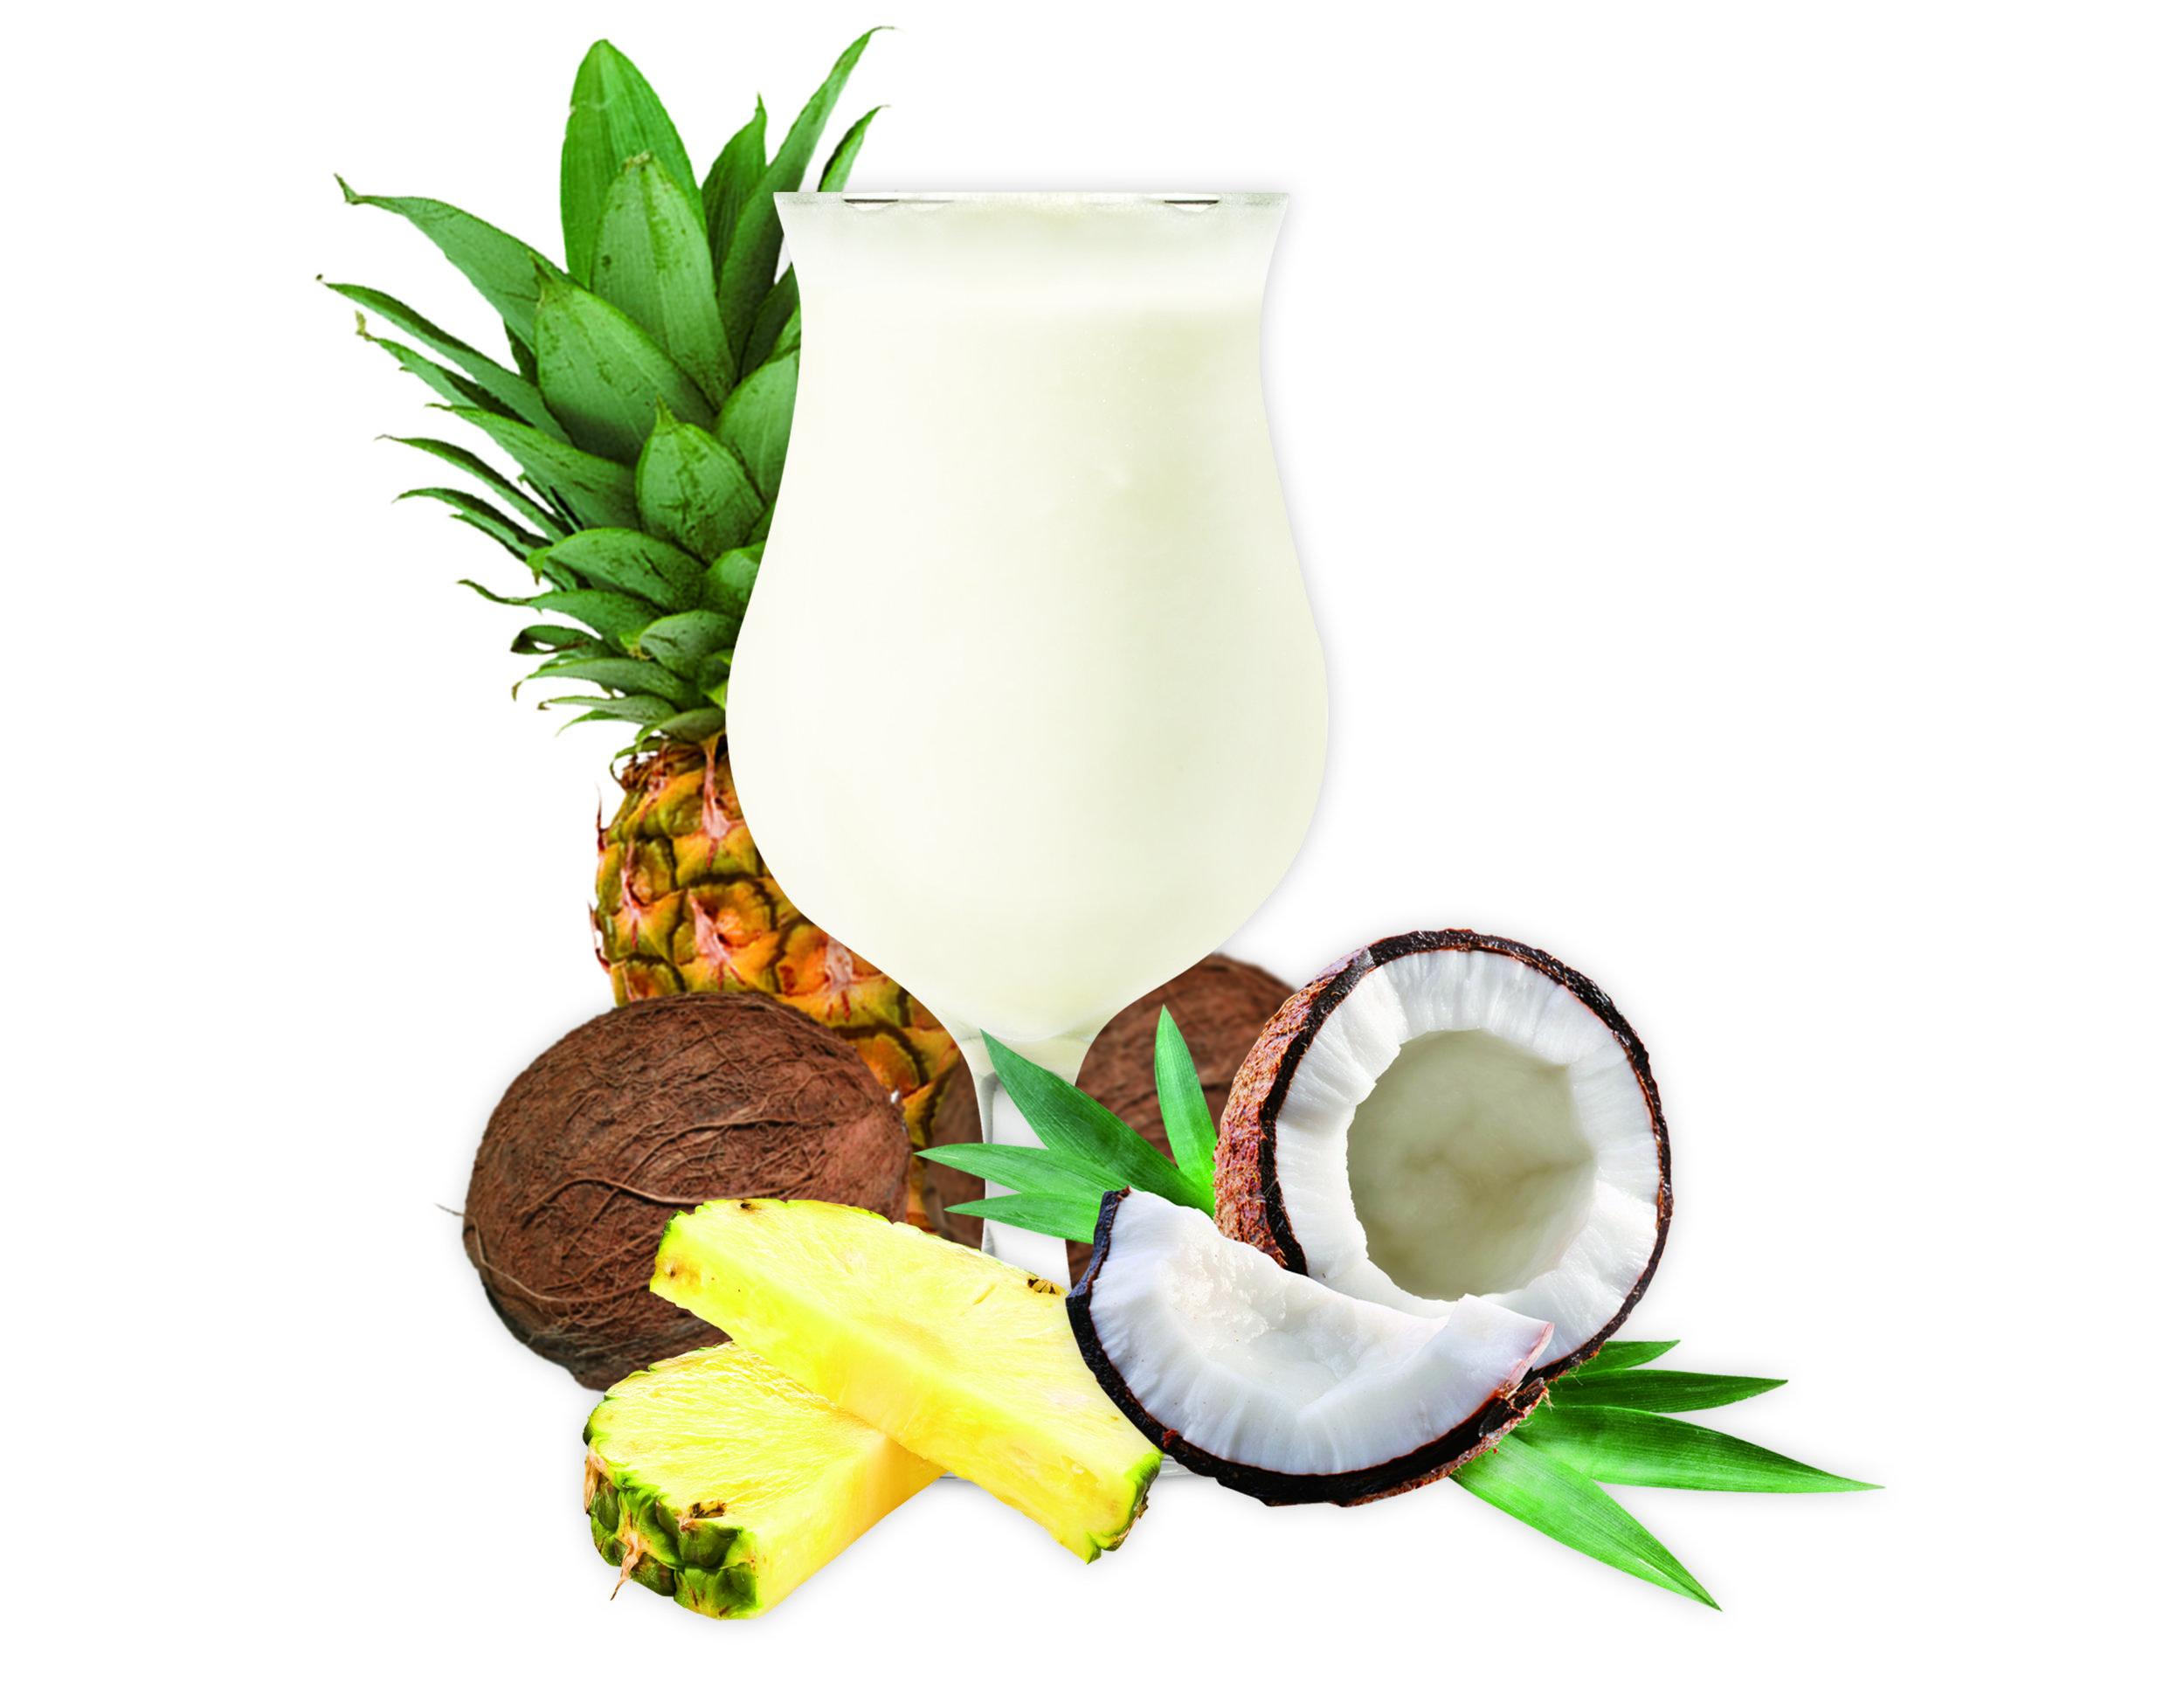 03135-Piña-Colada-Flavoured-Drink-Mix.jpg